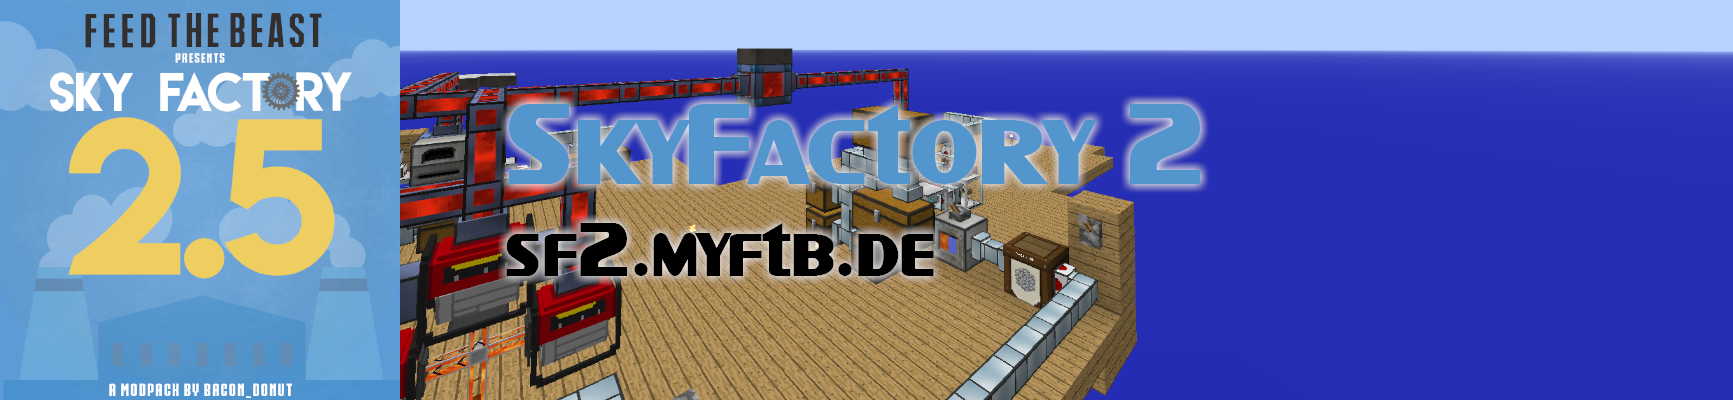 SkyFactory2